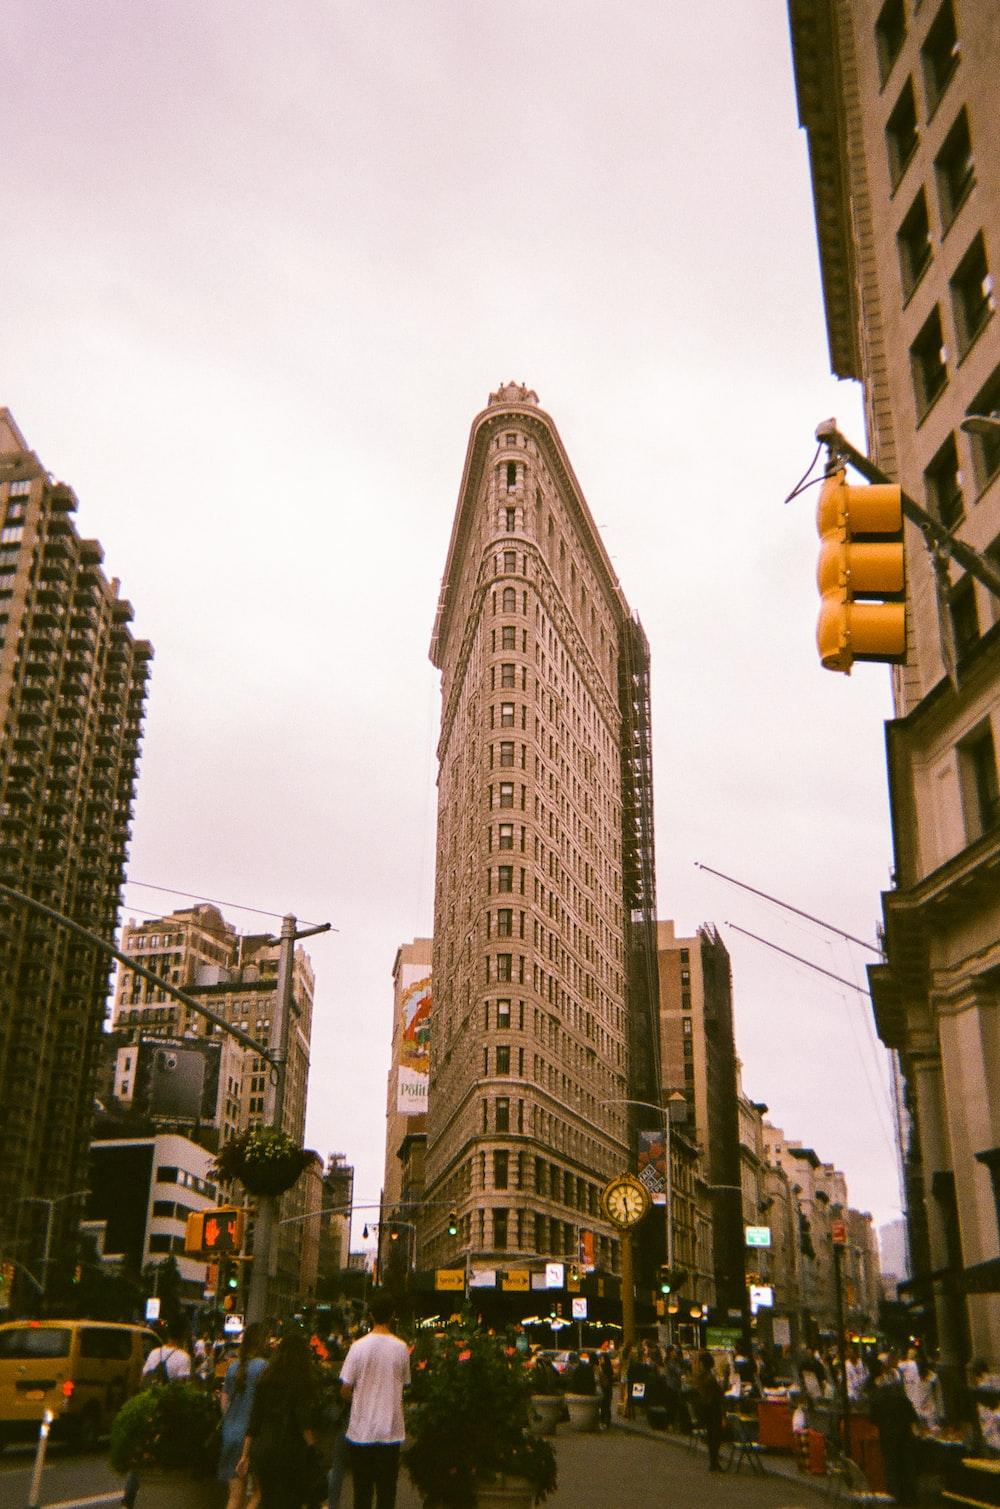 beige painted city building